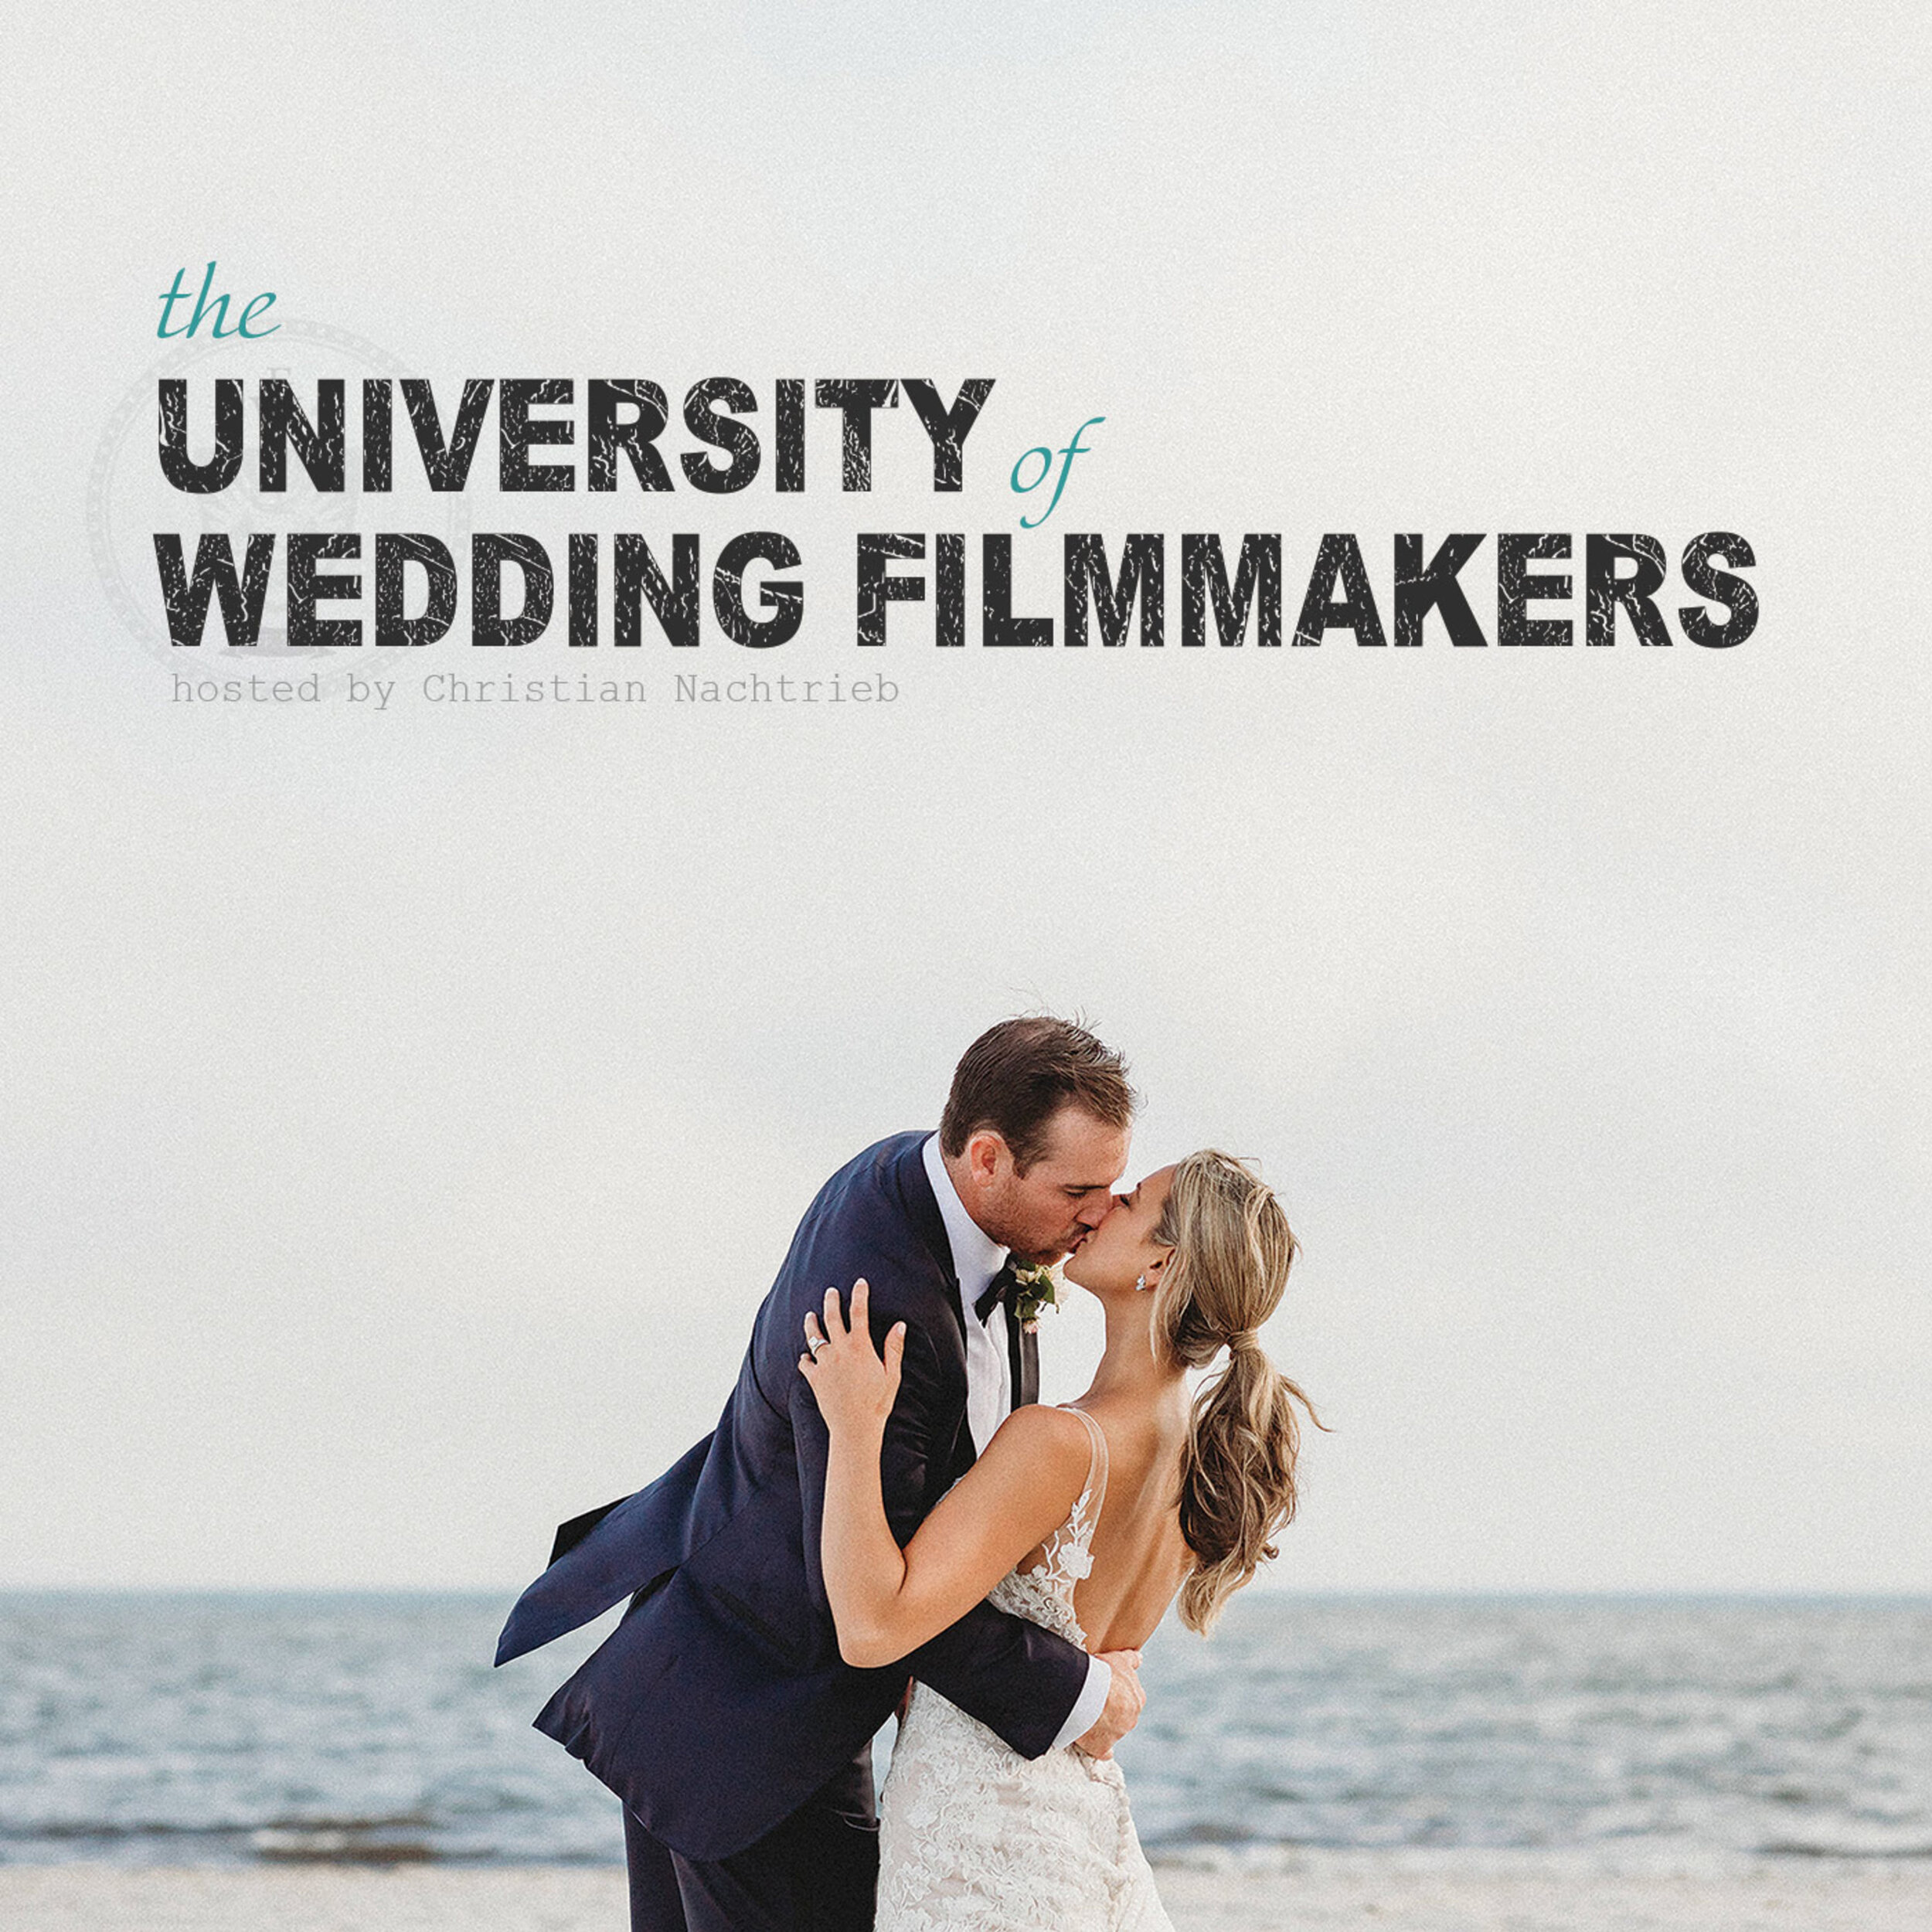 university of wedding filmmakers logo